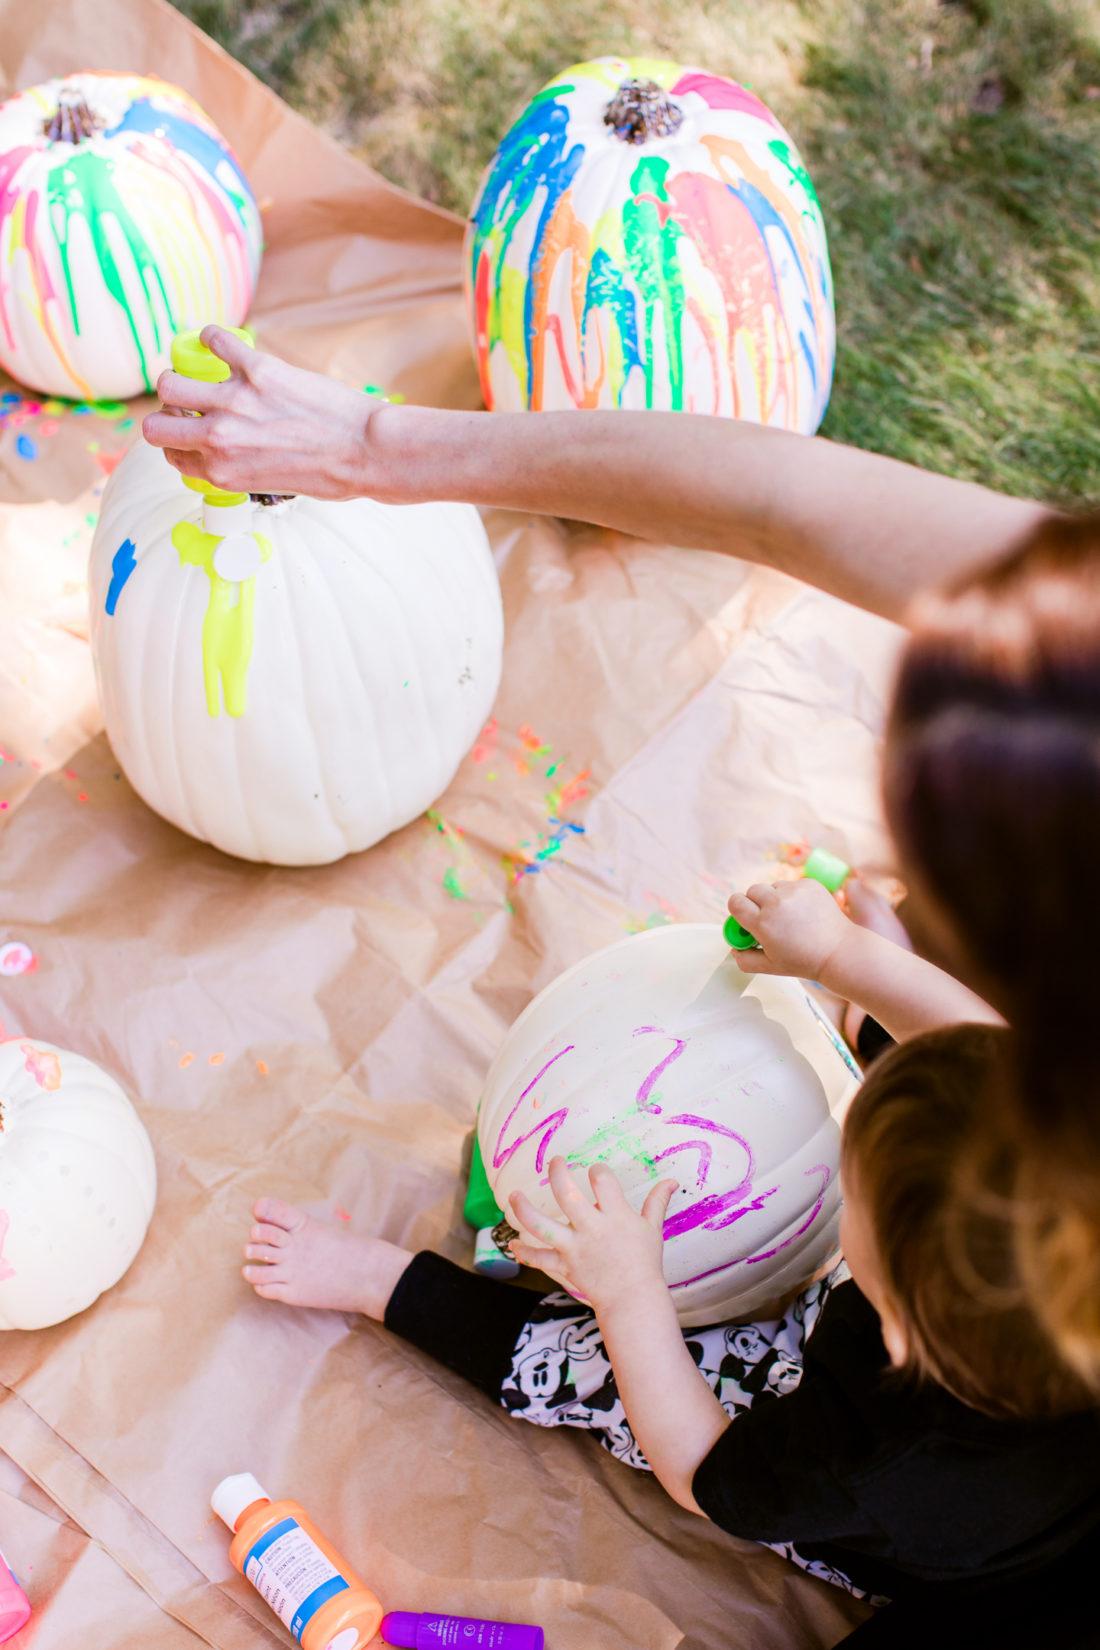 Eva Amurri Martino and Major Martino create some DIY technicolor pumpkins together